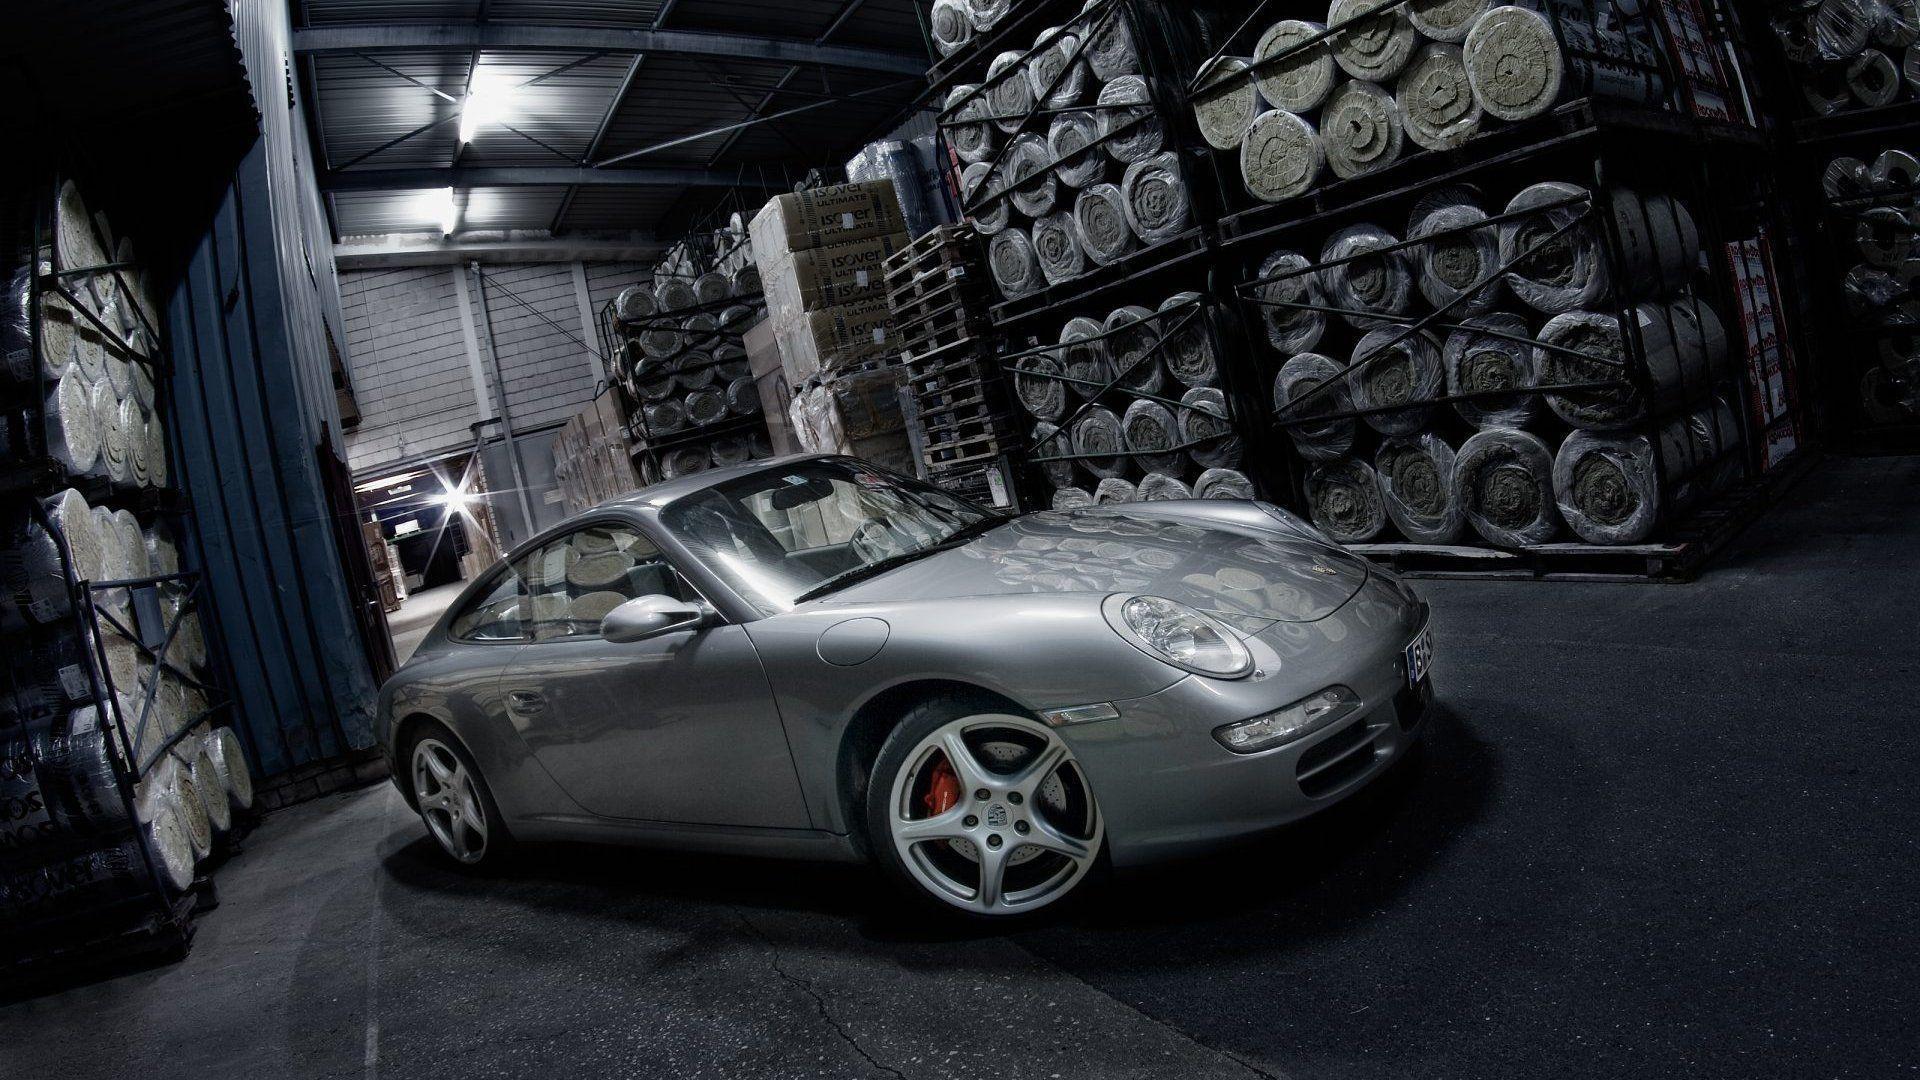 Cool Porsche Exclusive HD Wallpapers #1814